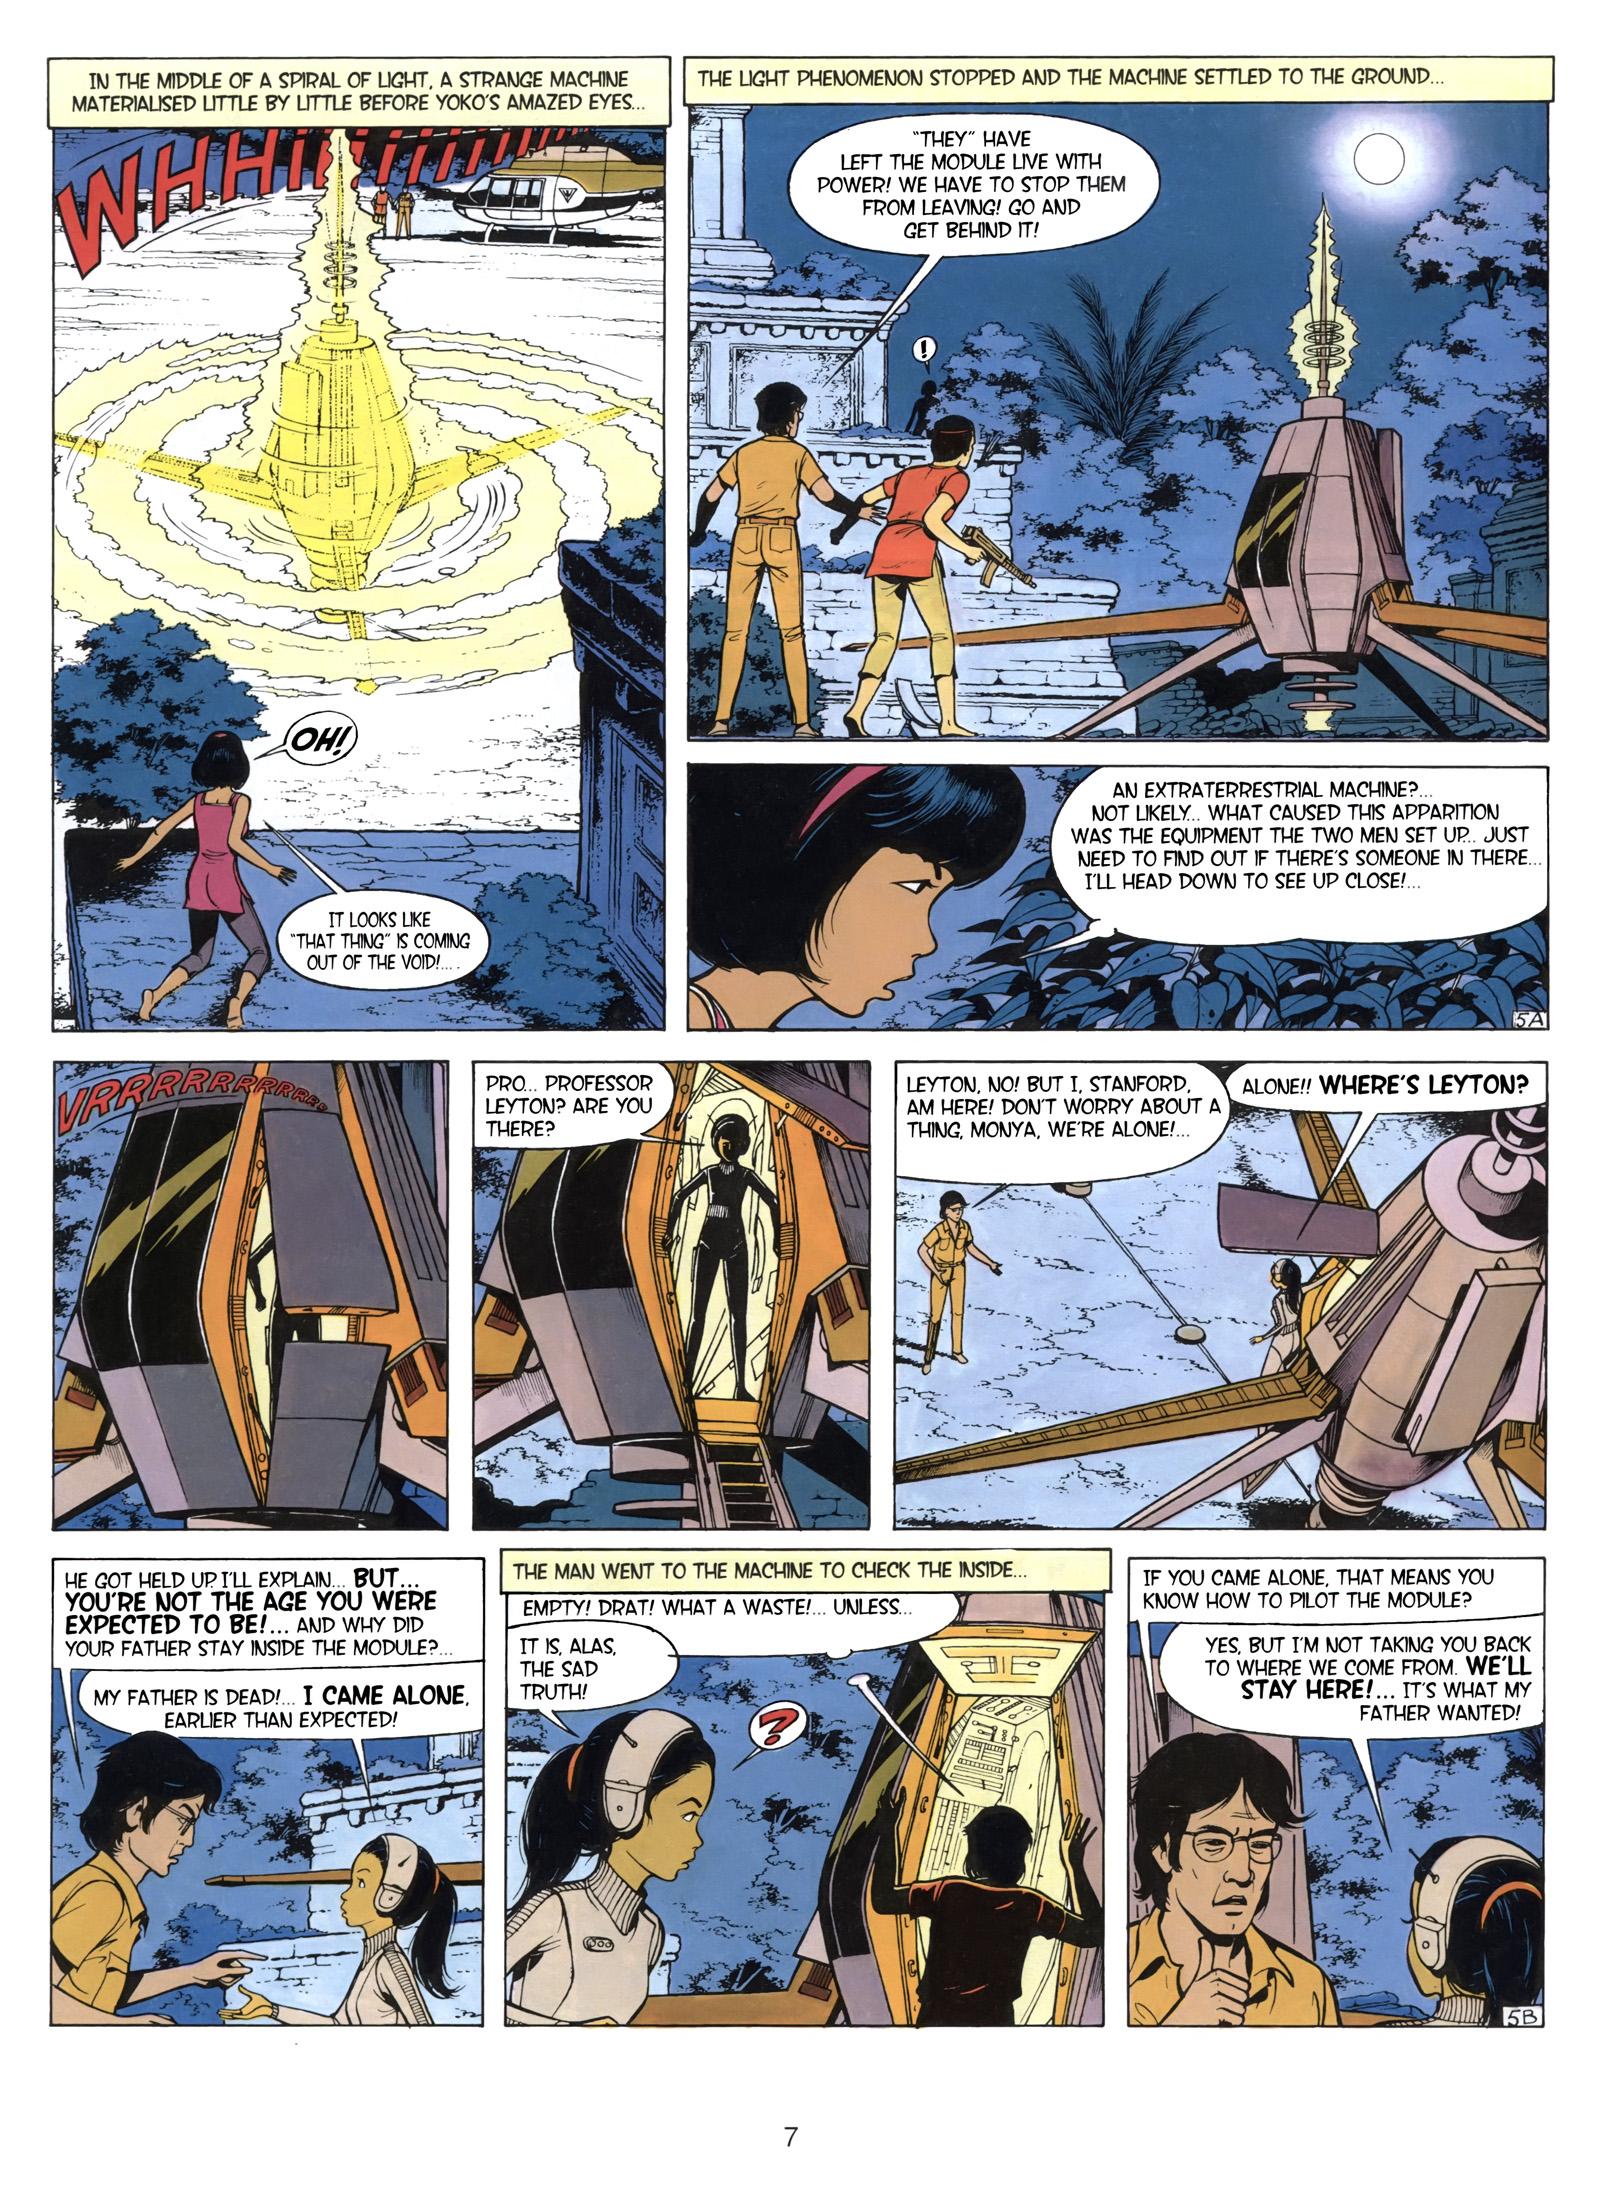 Yoko Tsuno The Time Spiral review